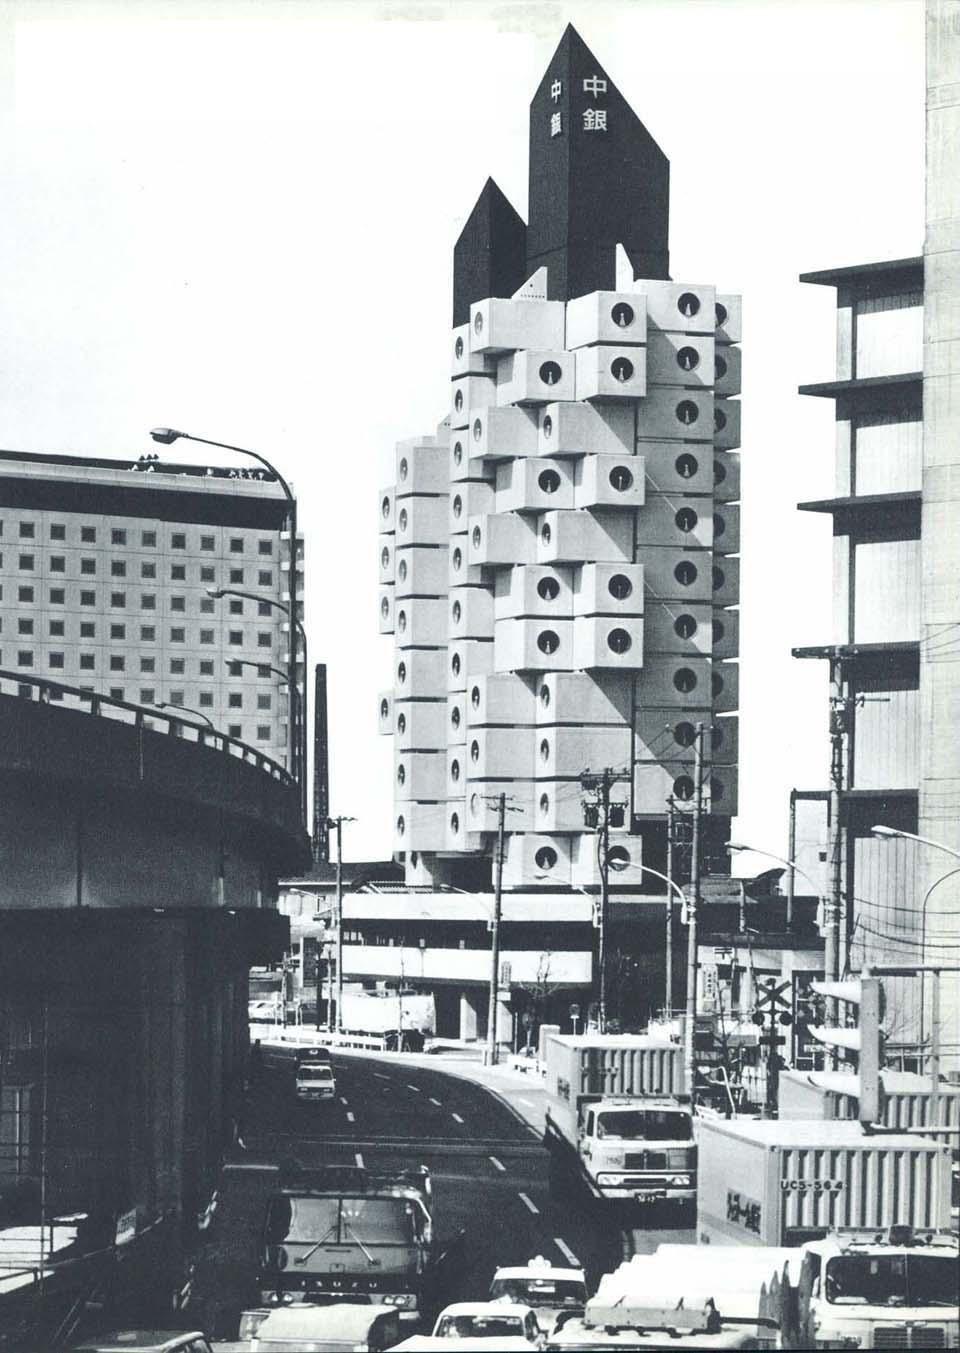 Nakagin Capsule Tower In Tokyo Kisho Kurokawa Archeyes